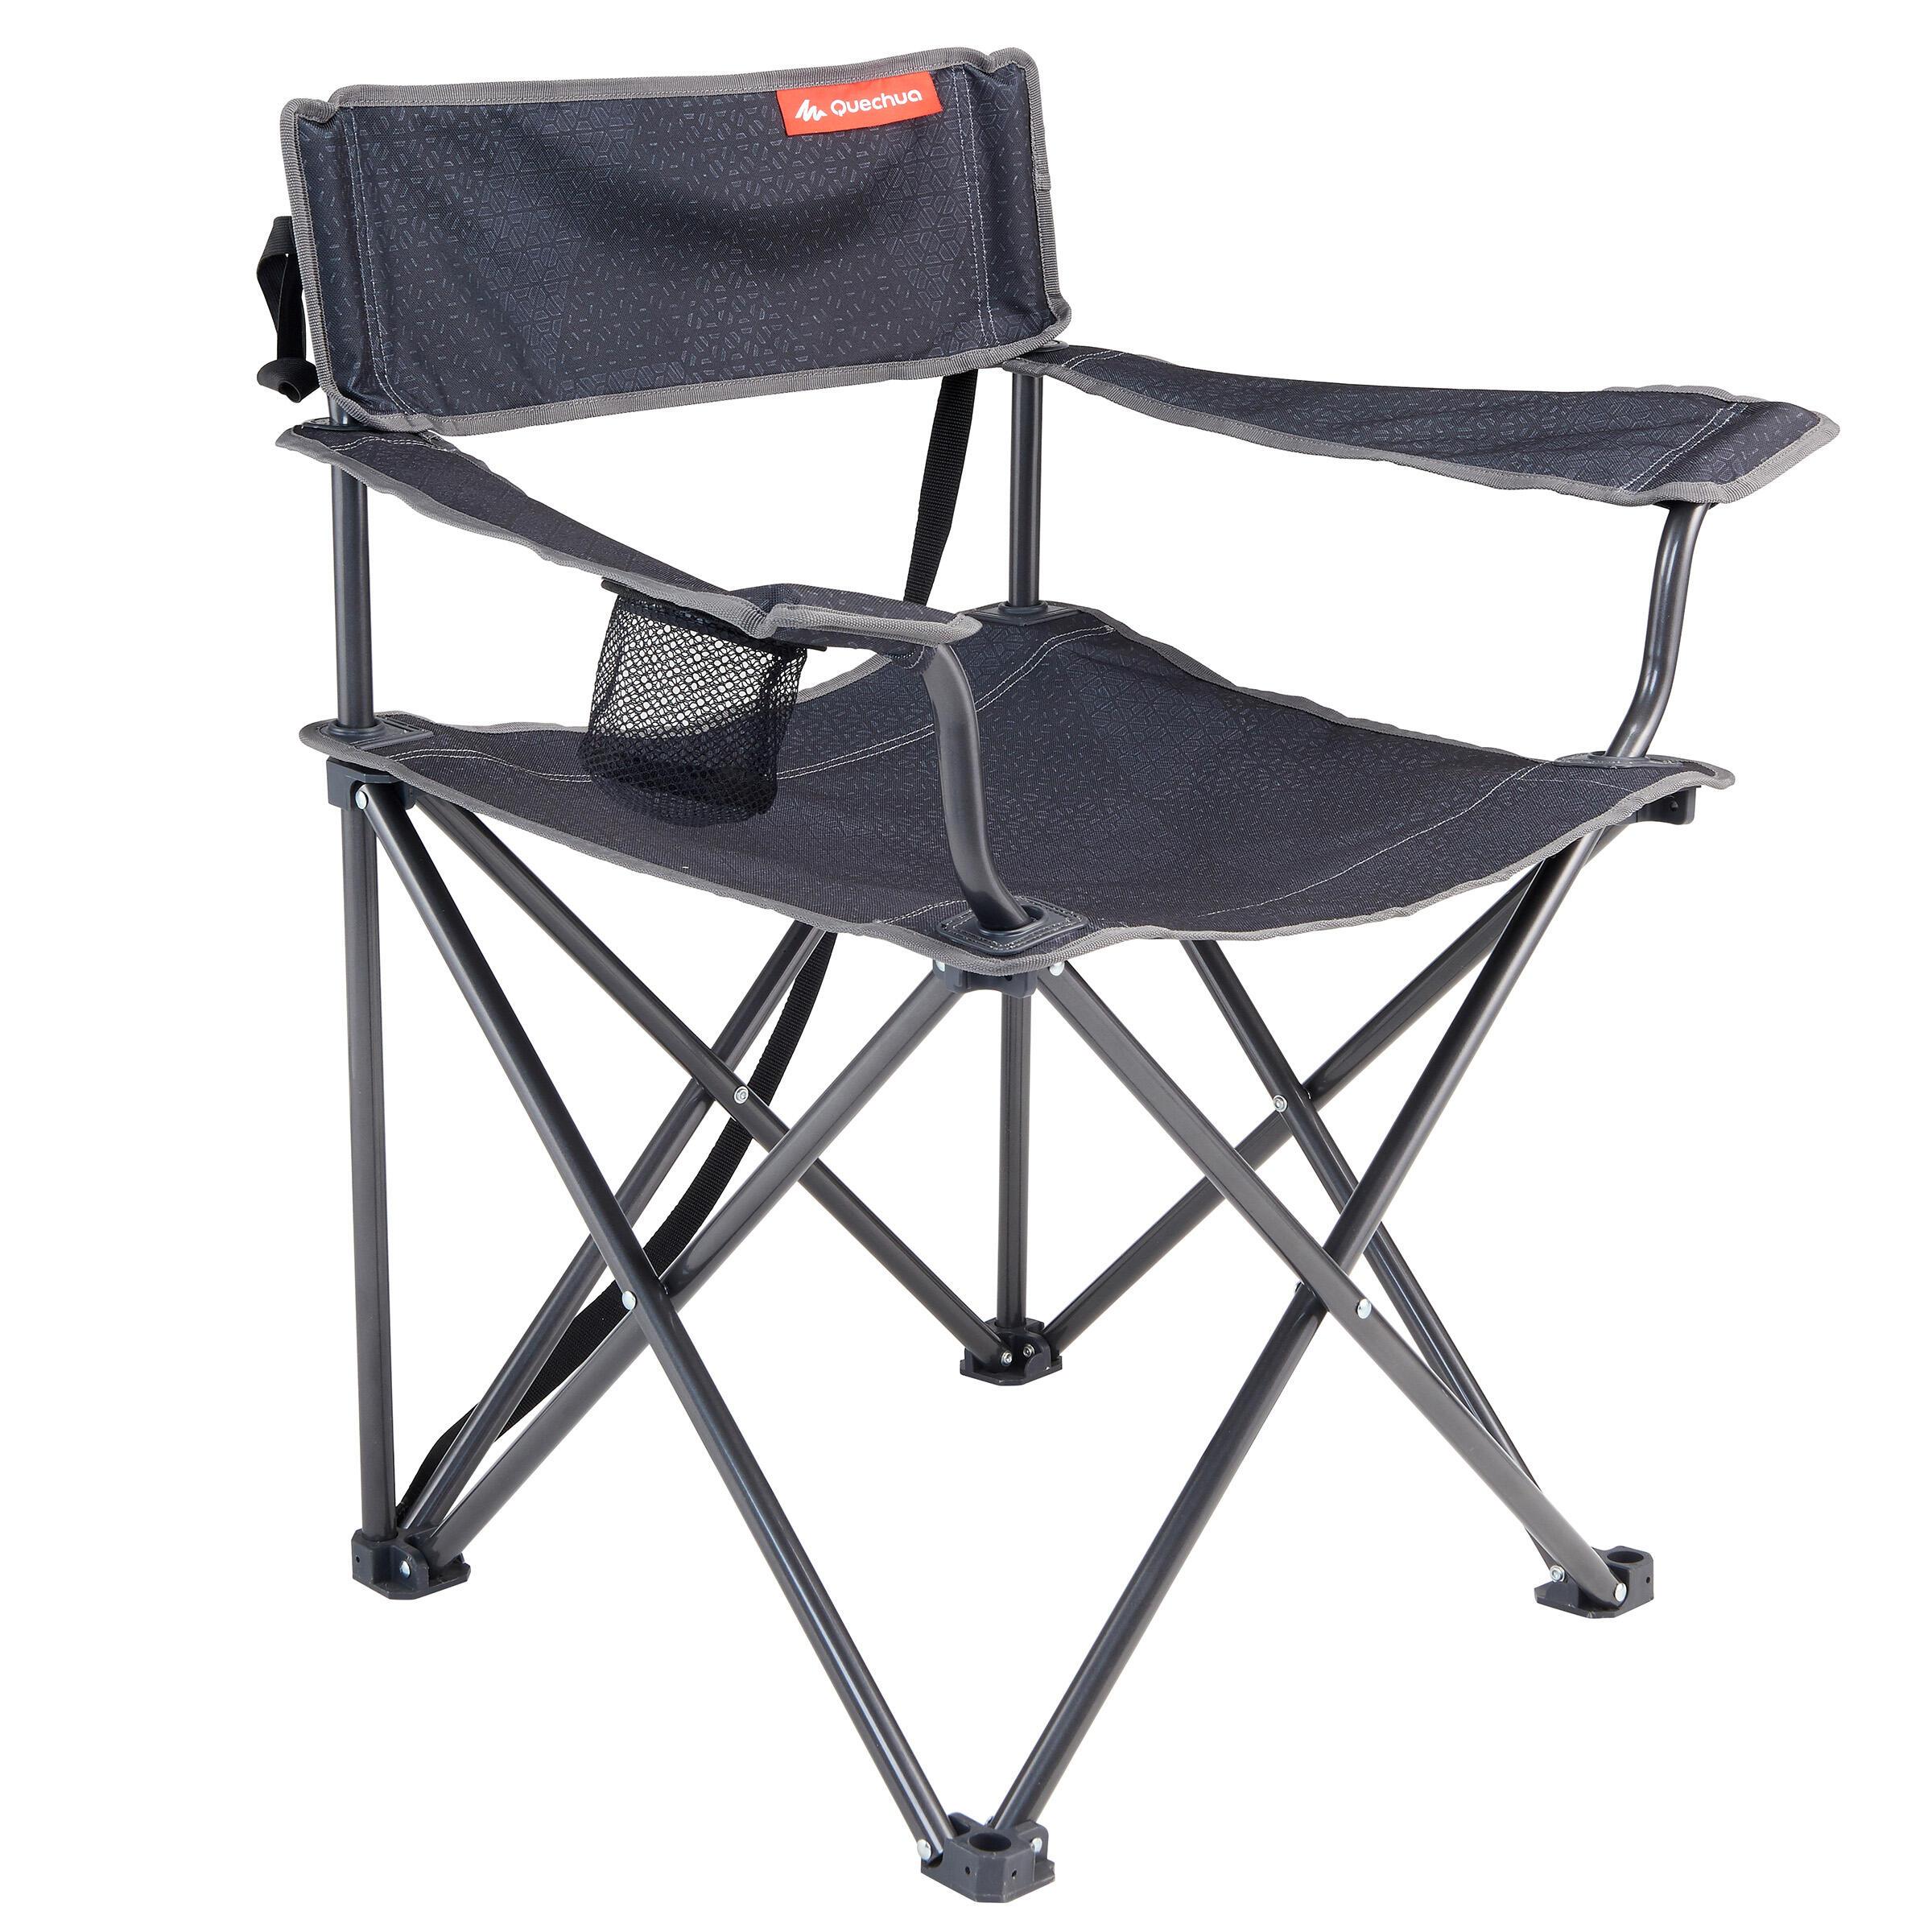 Klapstoel Kind Camping.Campingstoelen En Krukjes Kopen Decathlon Nl